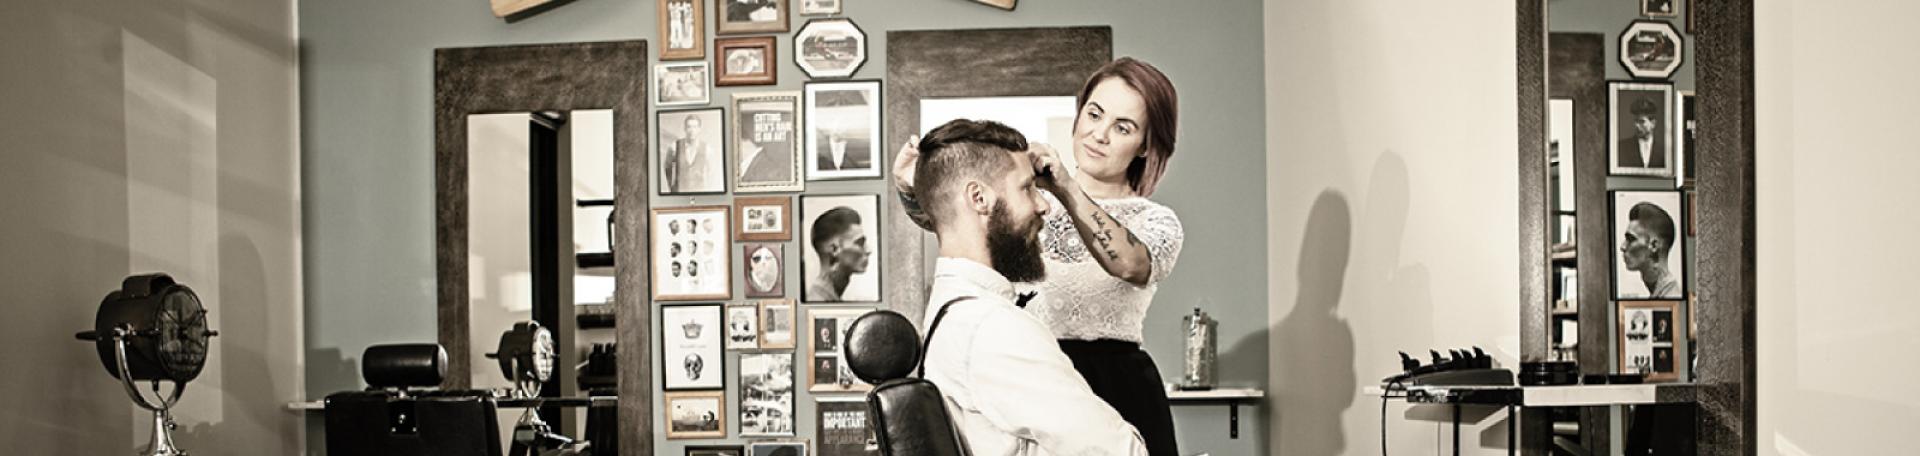 Barbering Vacancies